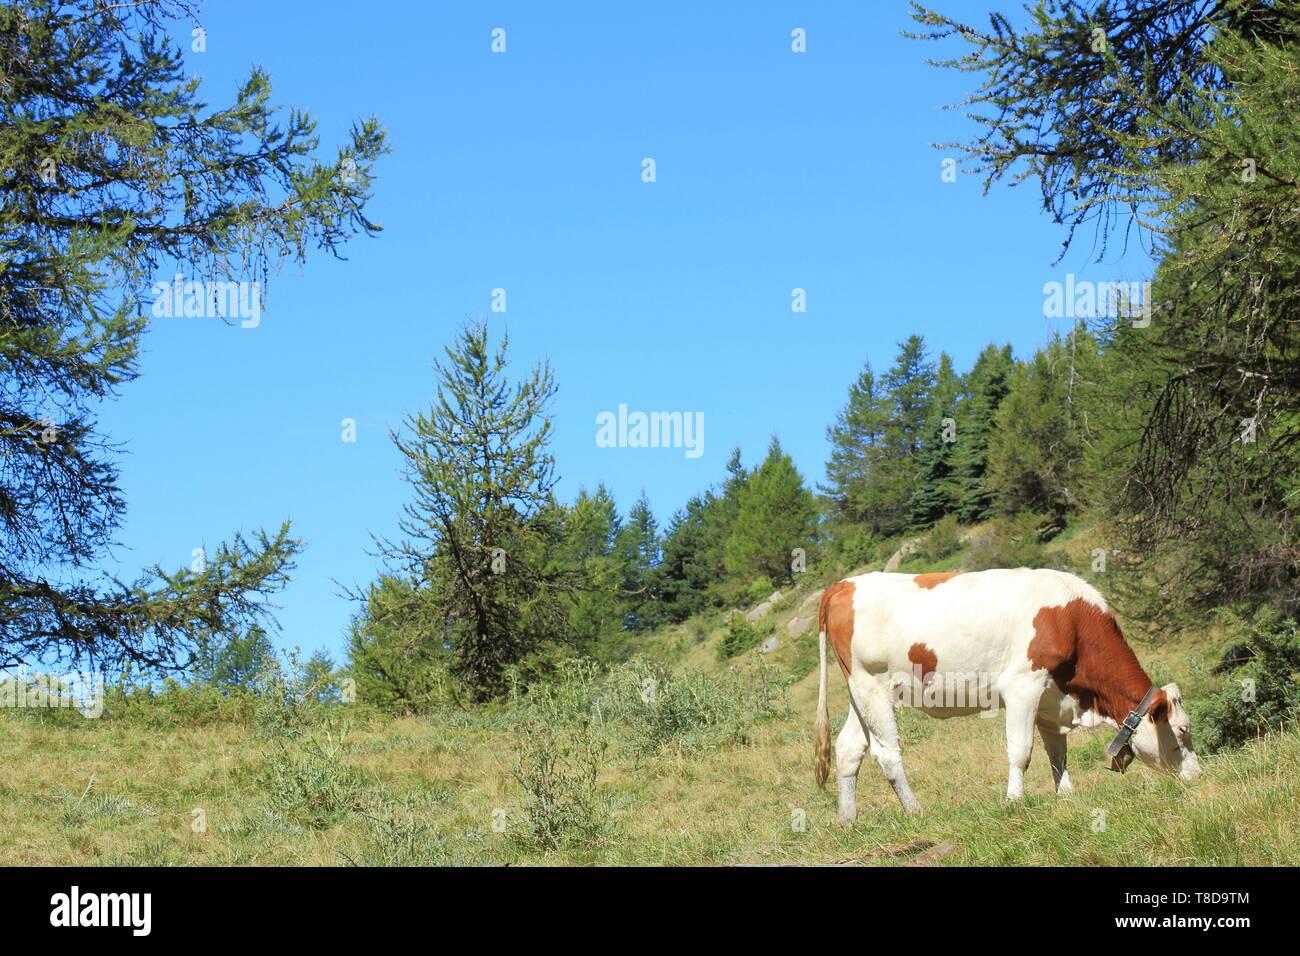 France, Hautes Alpes, Haut Champsaur, Ancelle, Col de Moissiere, cows at liberty in high mountain pastures Stock Photo